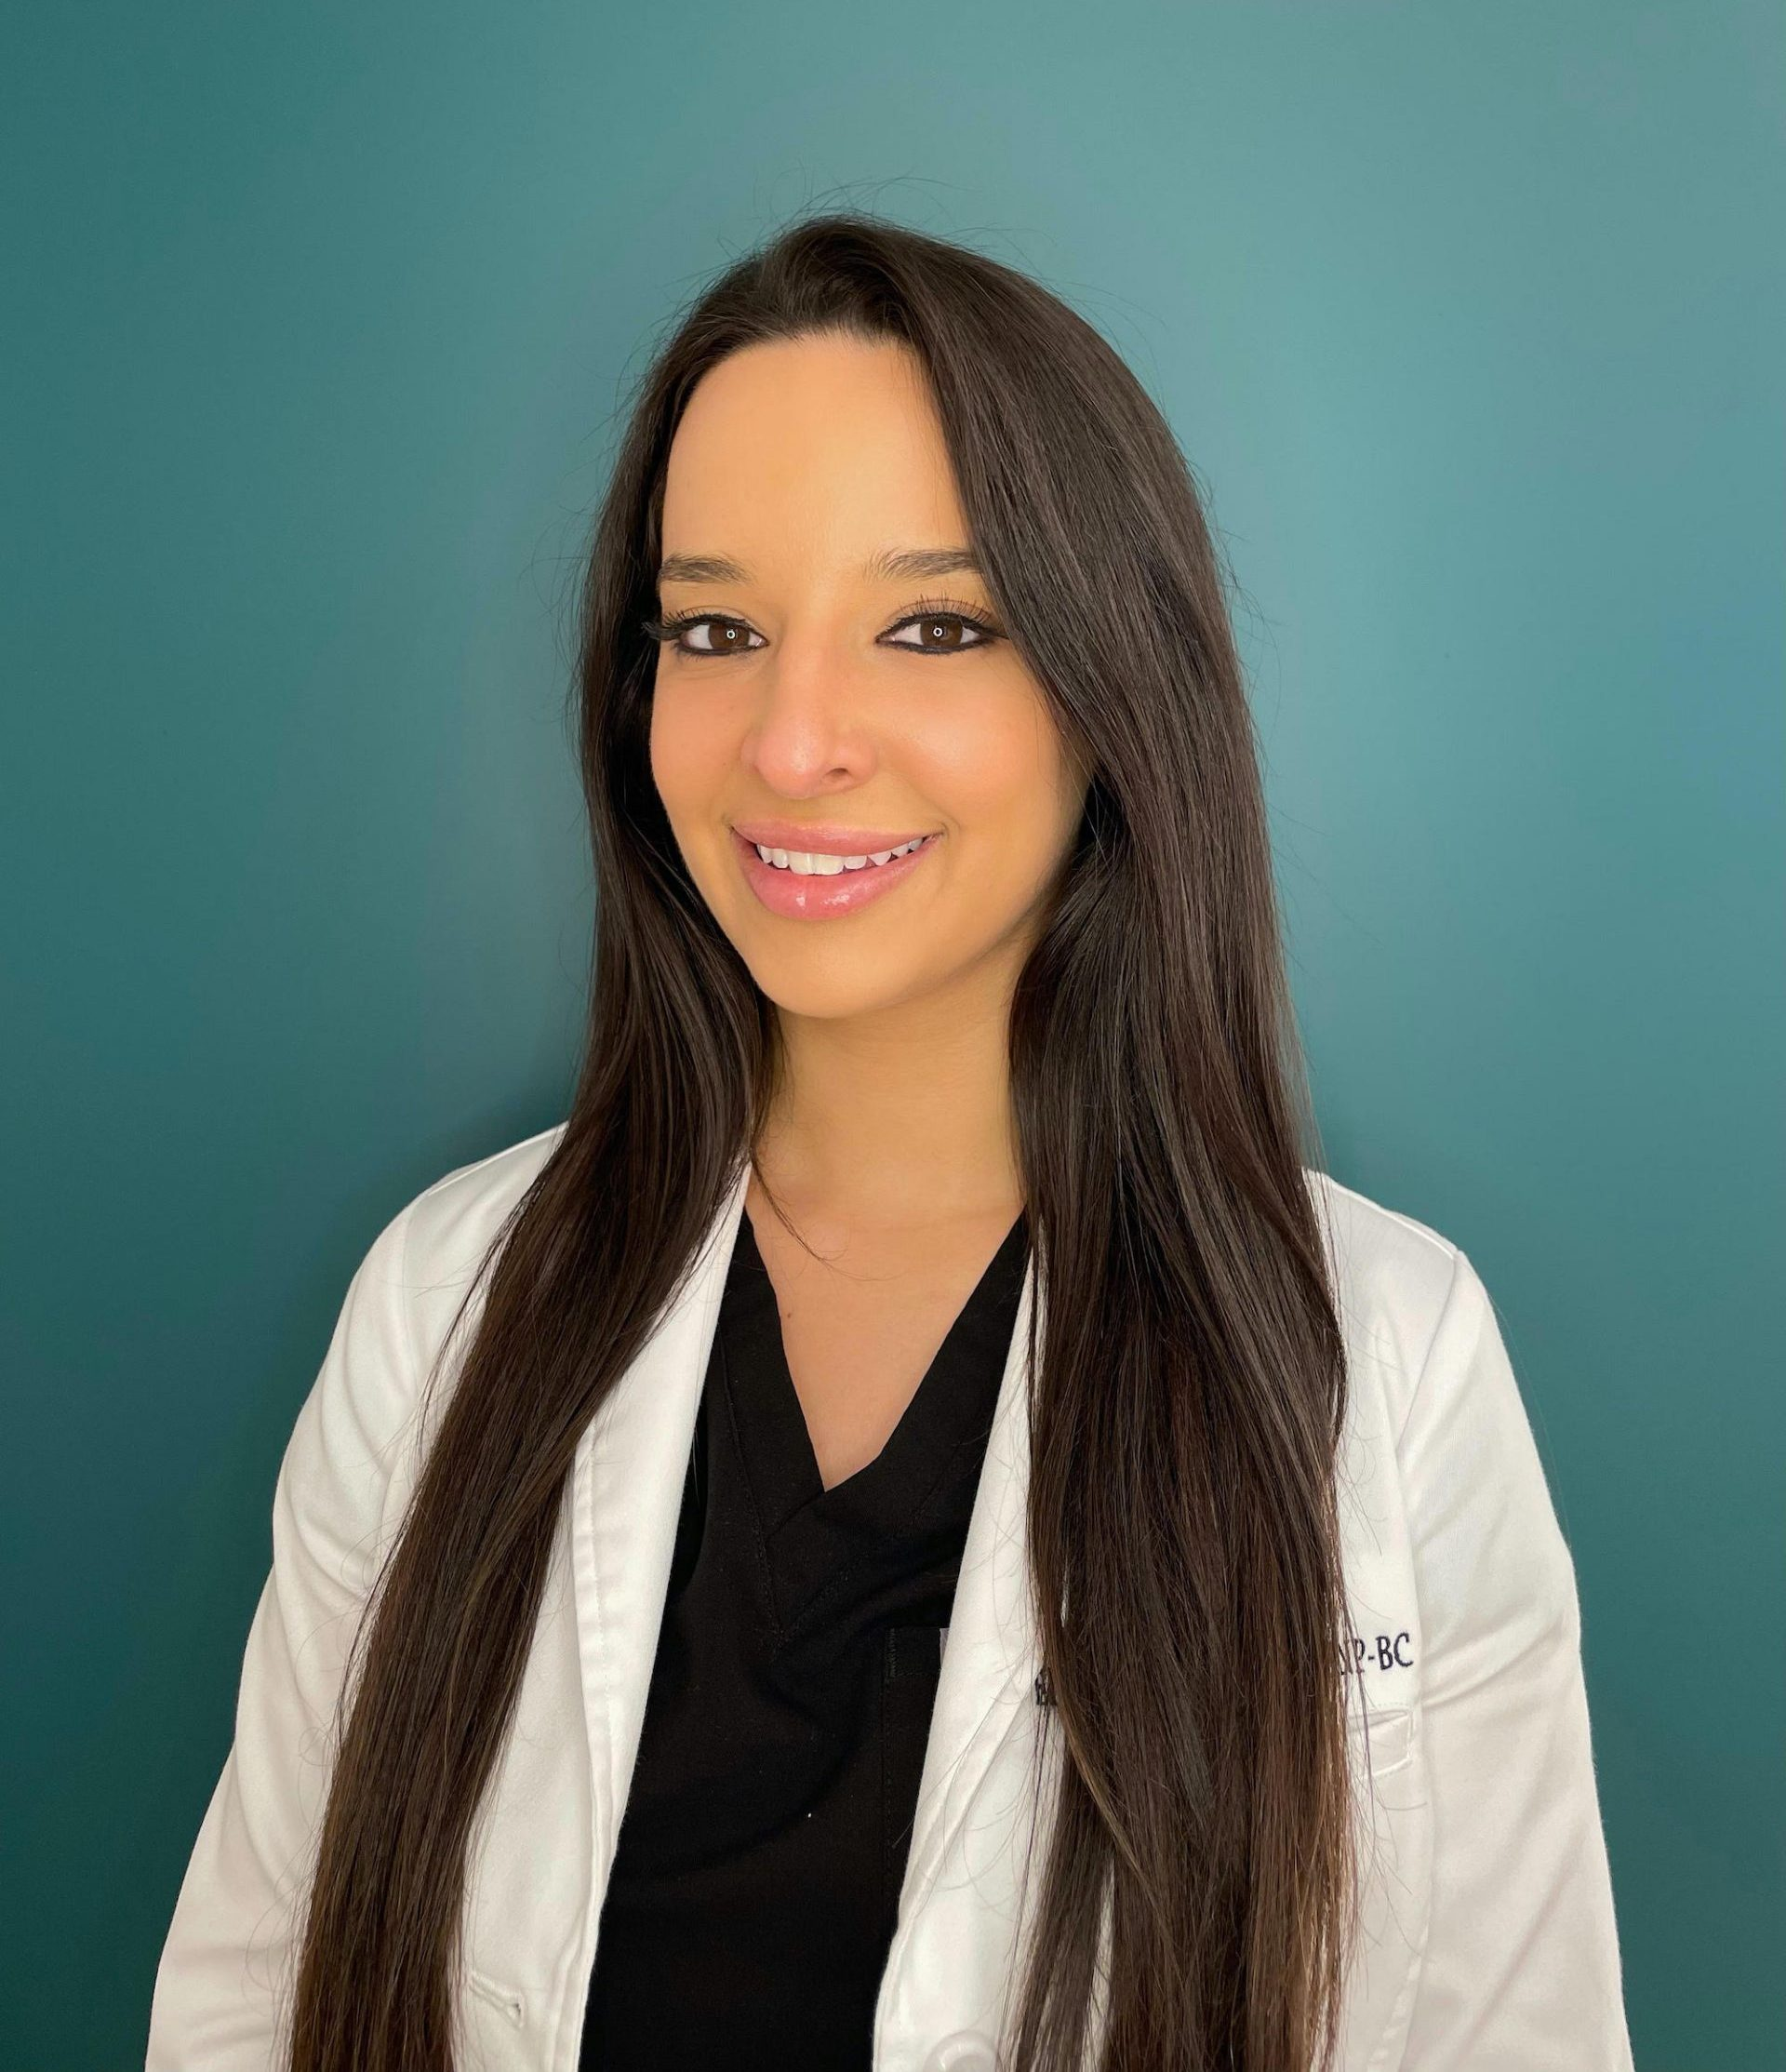 Veriheal Innovation in Cannabis Scholarship 2021 Winner Elizabeth Ranelli